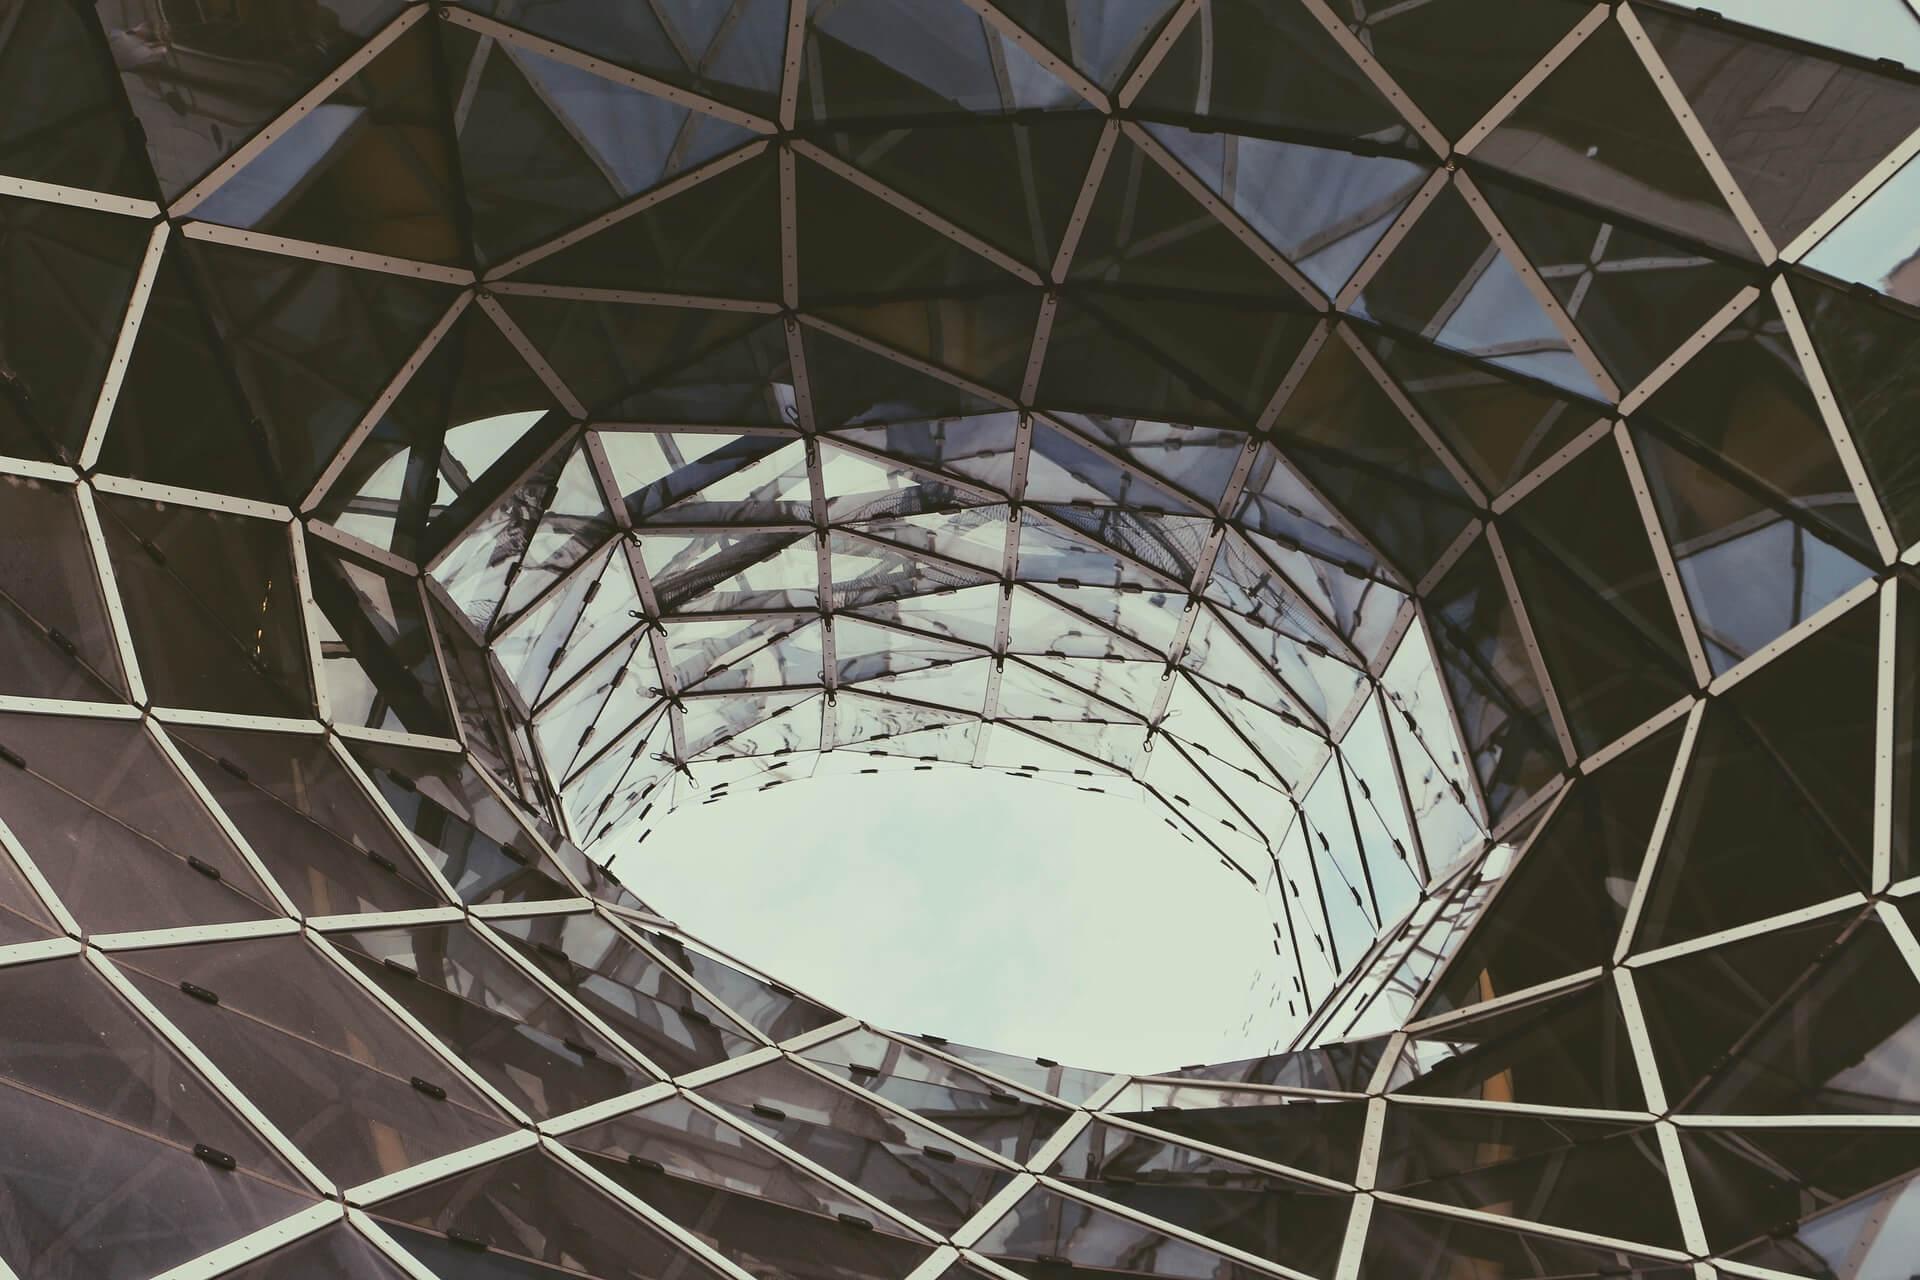 Steel structure design concept